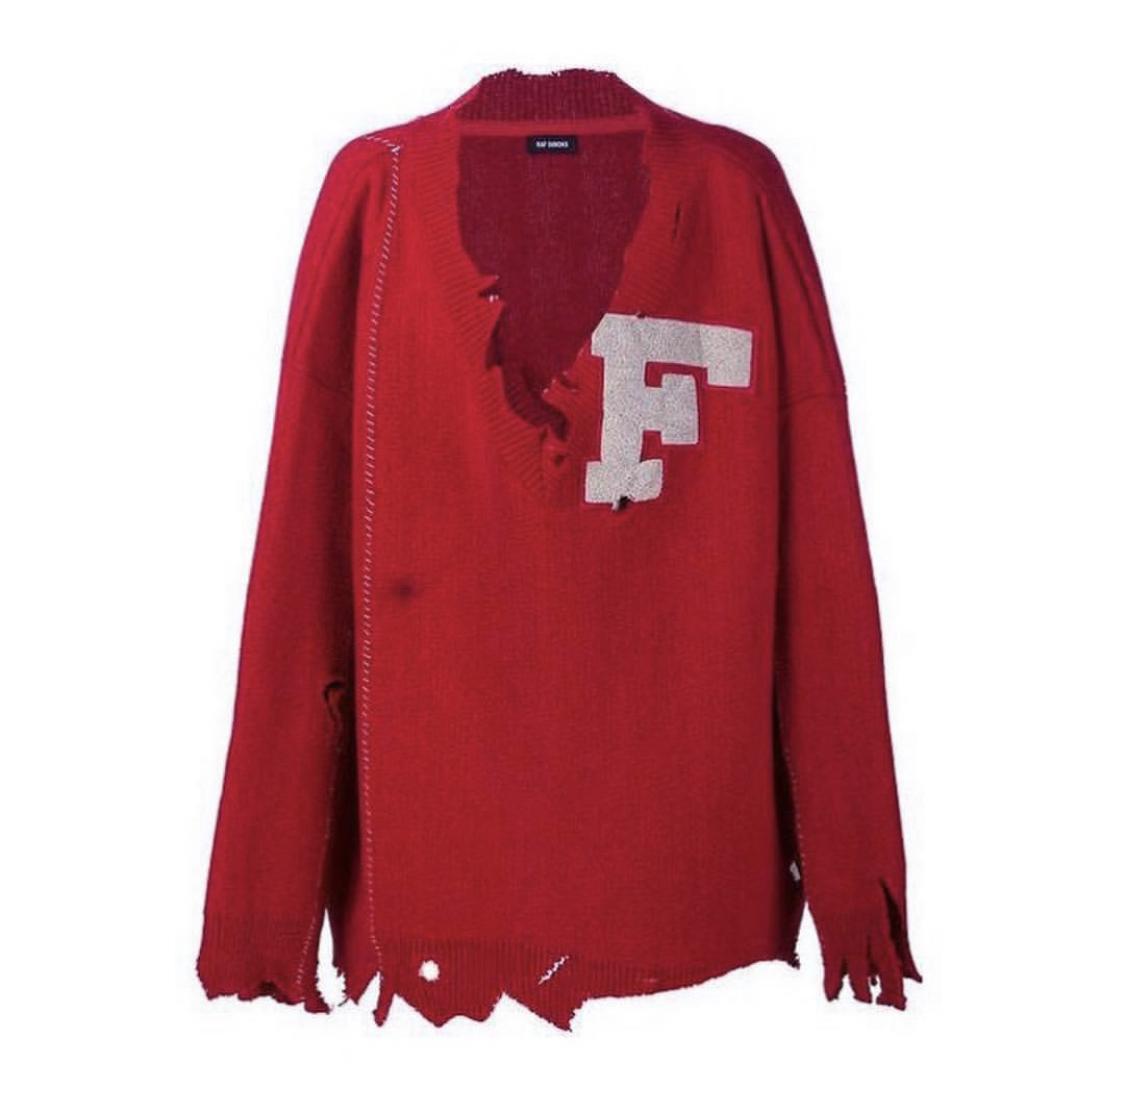 Raf Simons FW 16 red varsity sweater